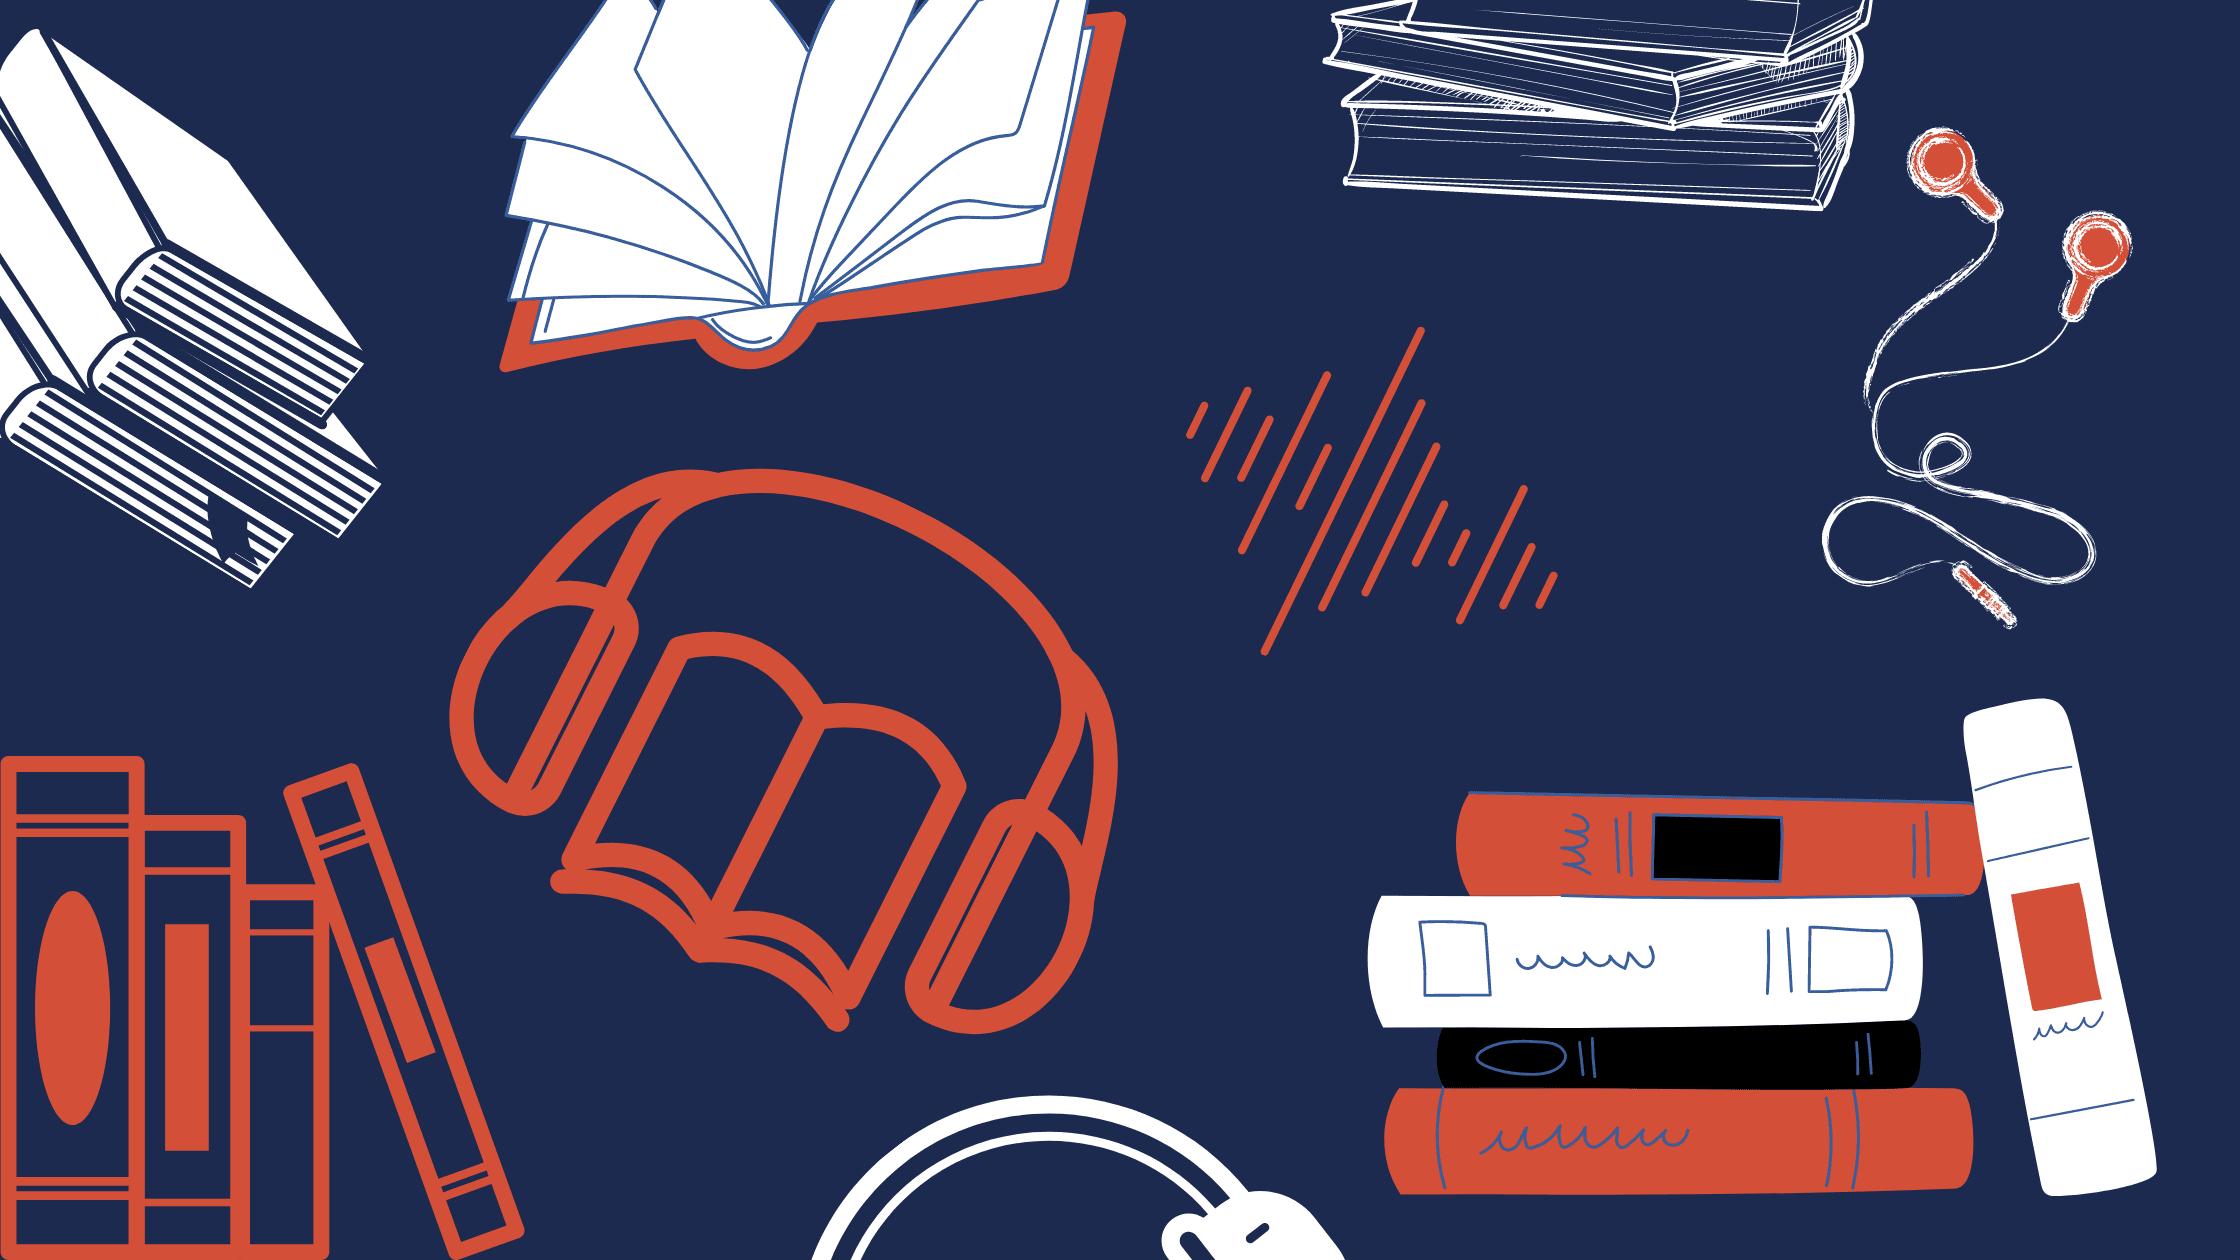 Top 5 Audiobooks for Seniors To Listen To